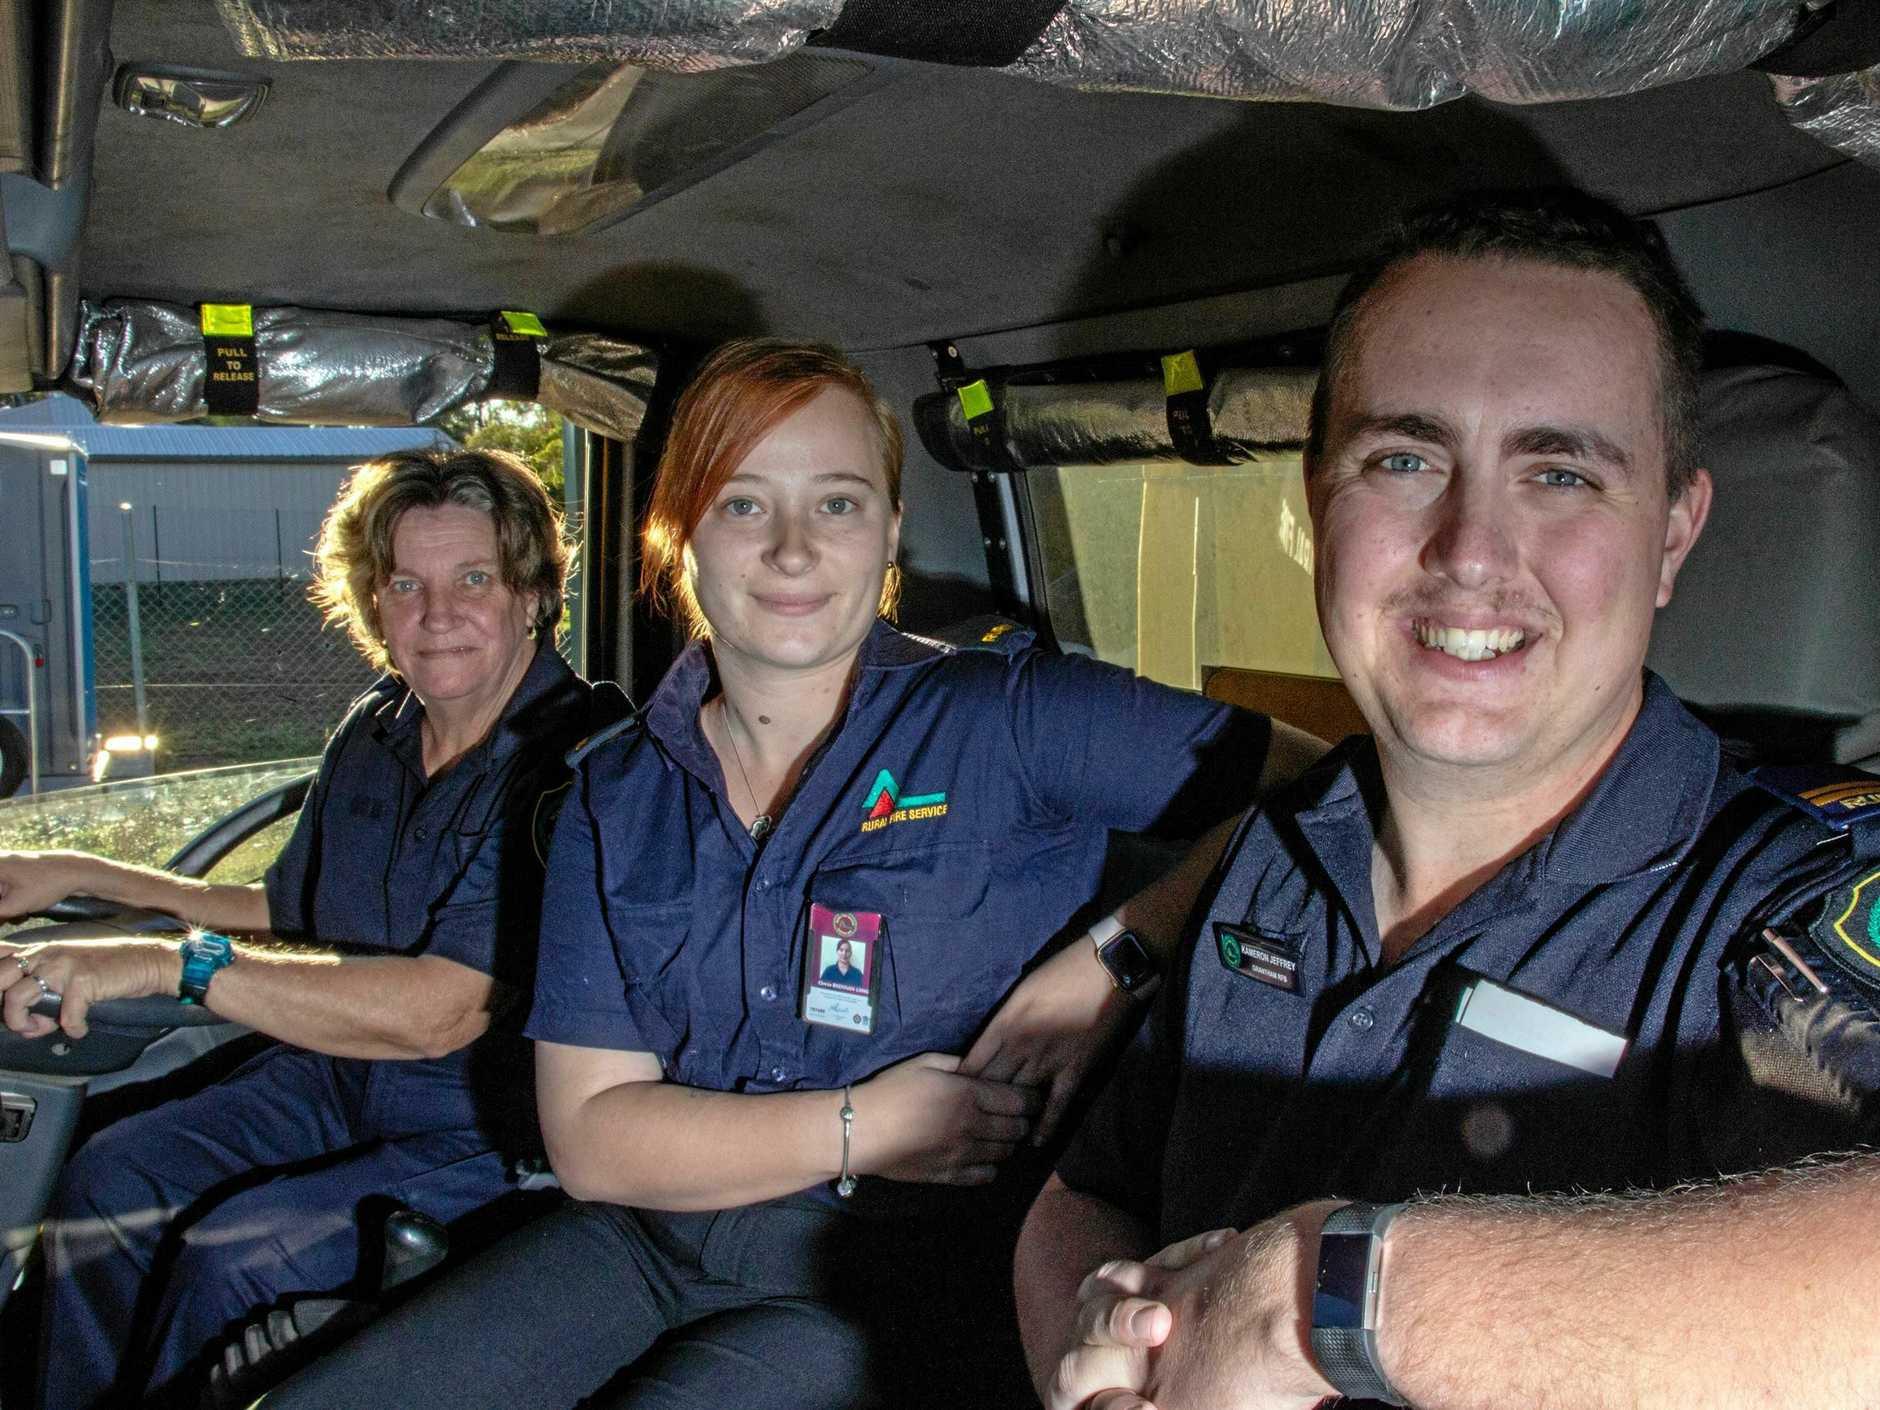 DESPERATE CALL: Grantham Rural Fire Brigade members Gilda Tate, Cherrie Brennan-Long and Kameron Jeffrey are calling for new members ahead of the fire season.